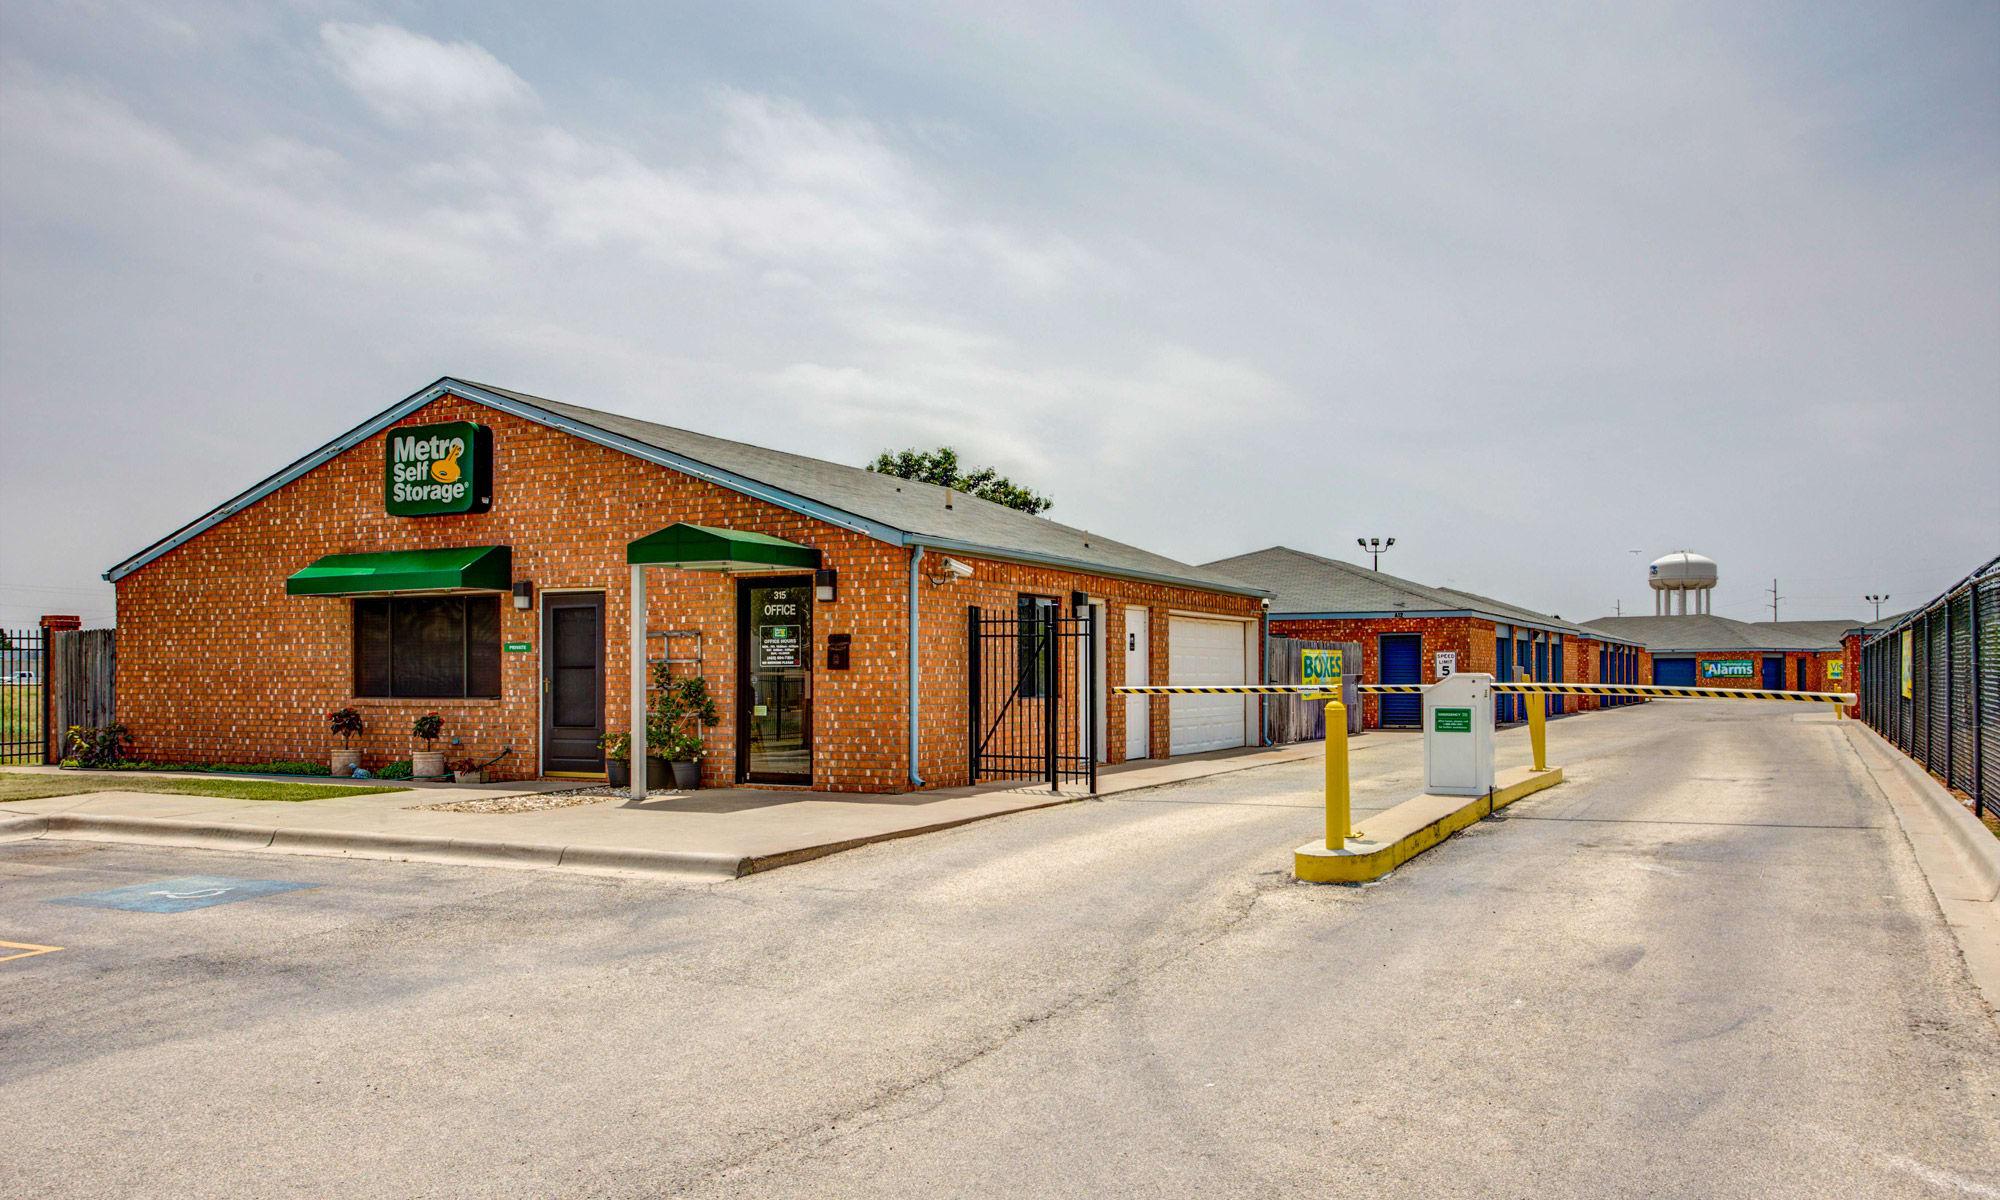 Metro Self Storage in Midland, TX